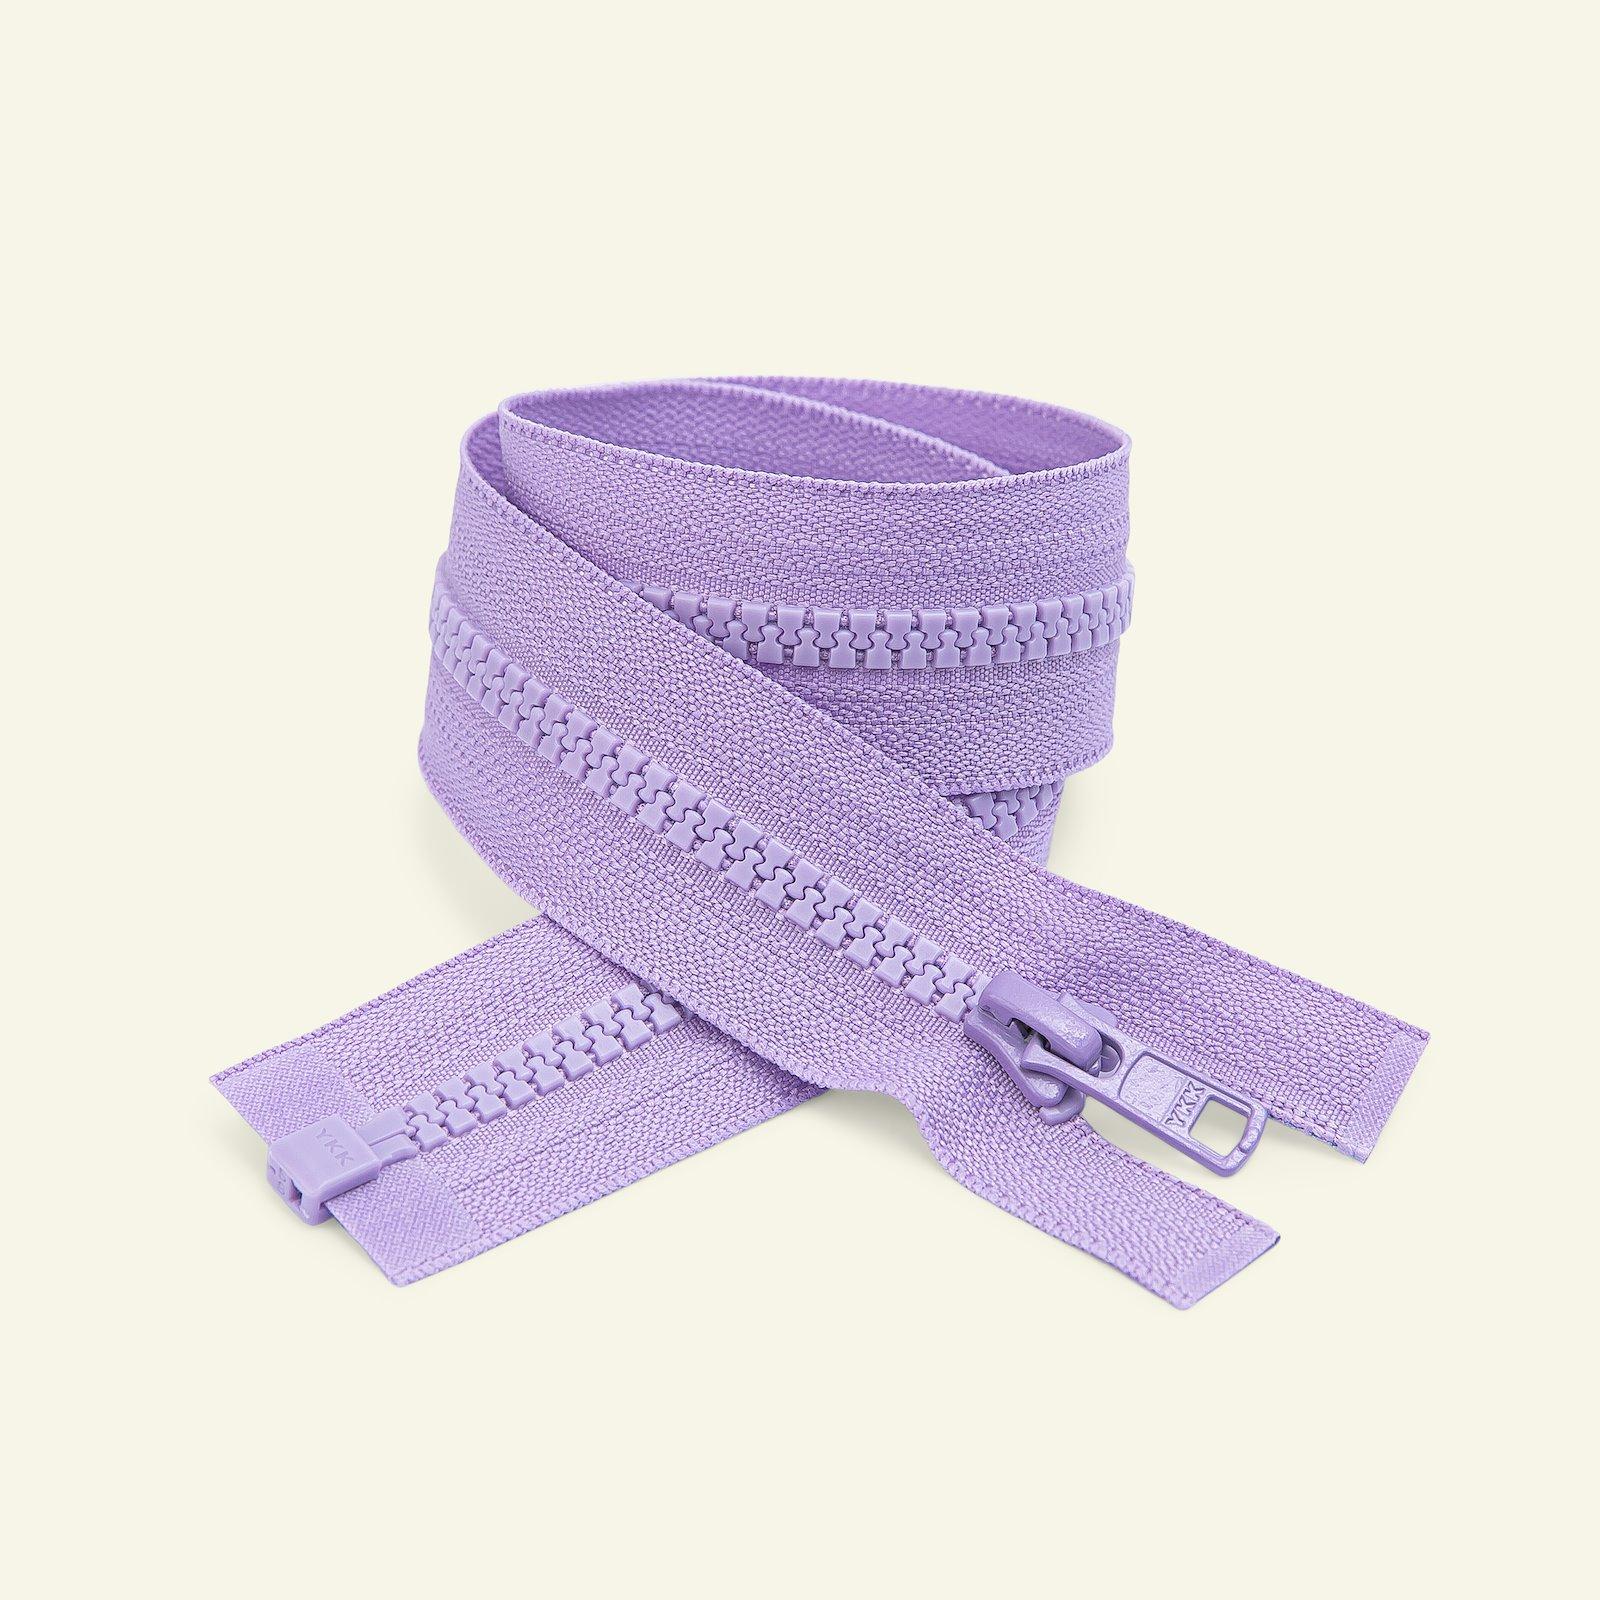 YKK zip 6mm open end 20cm light purple x50018_pack